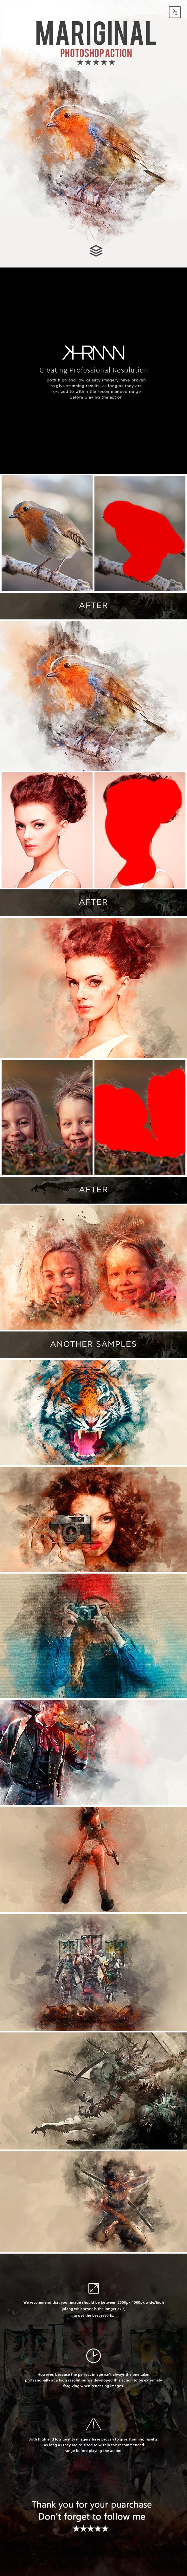 GraphicRiver Mariginal Photoshop Action 21056439